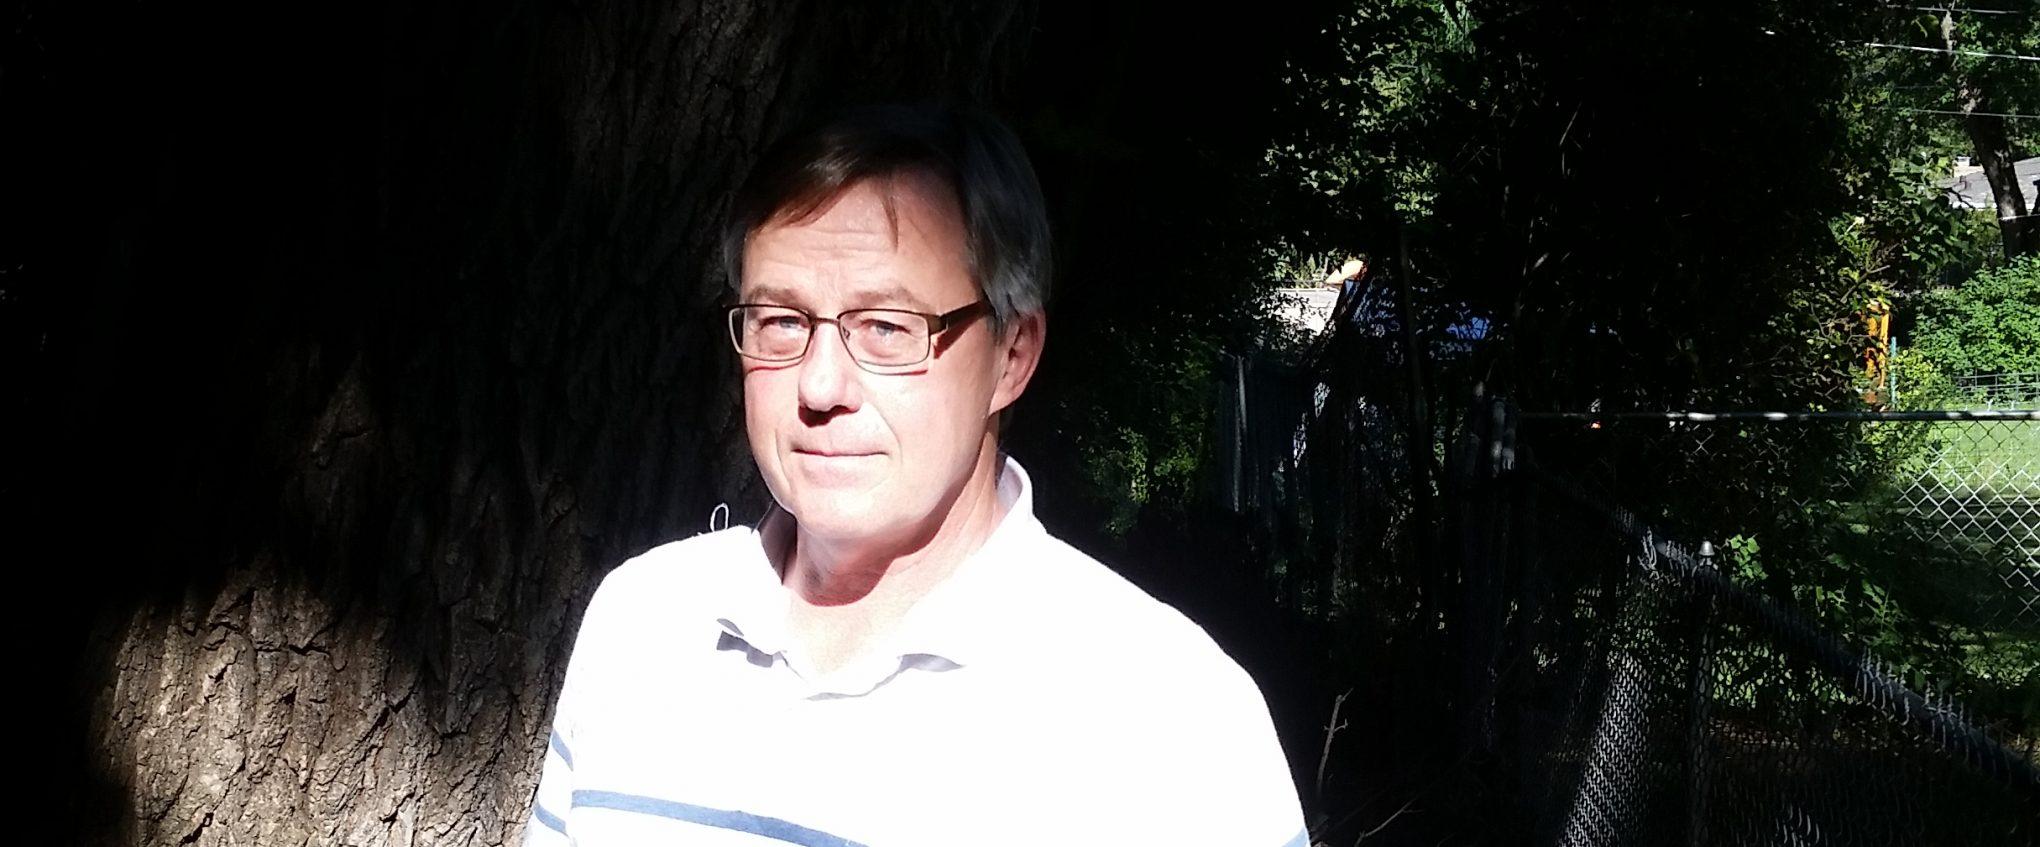 Todd Pierce, in Roseville, MN